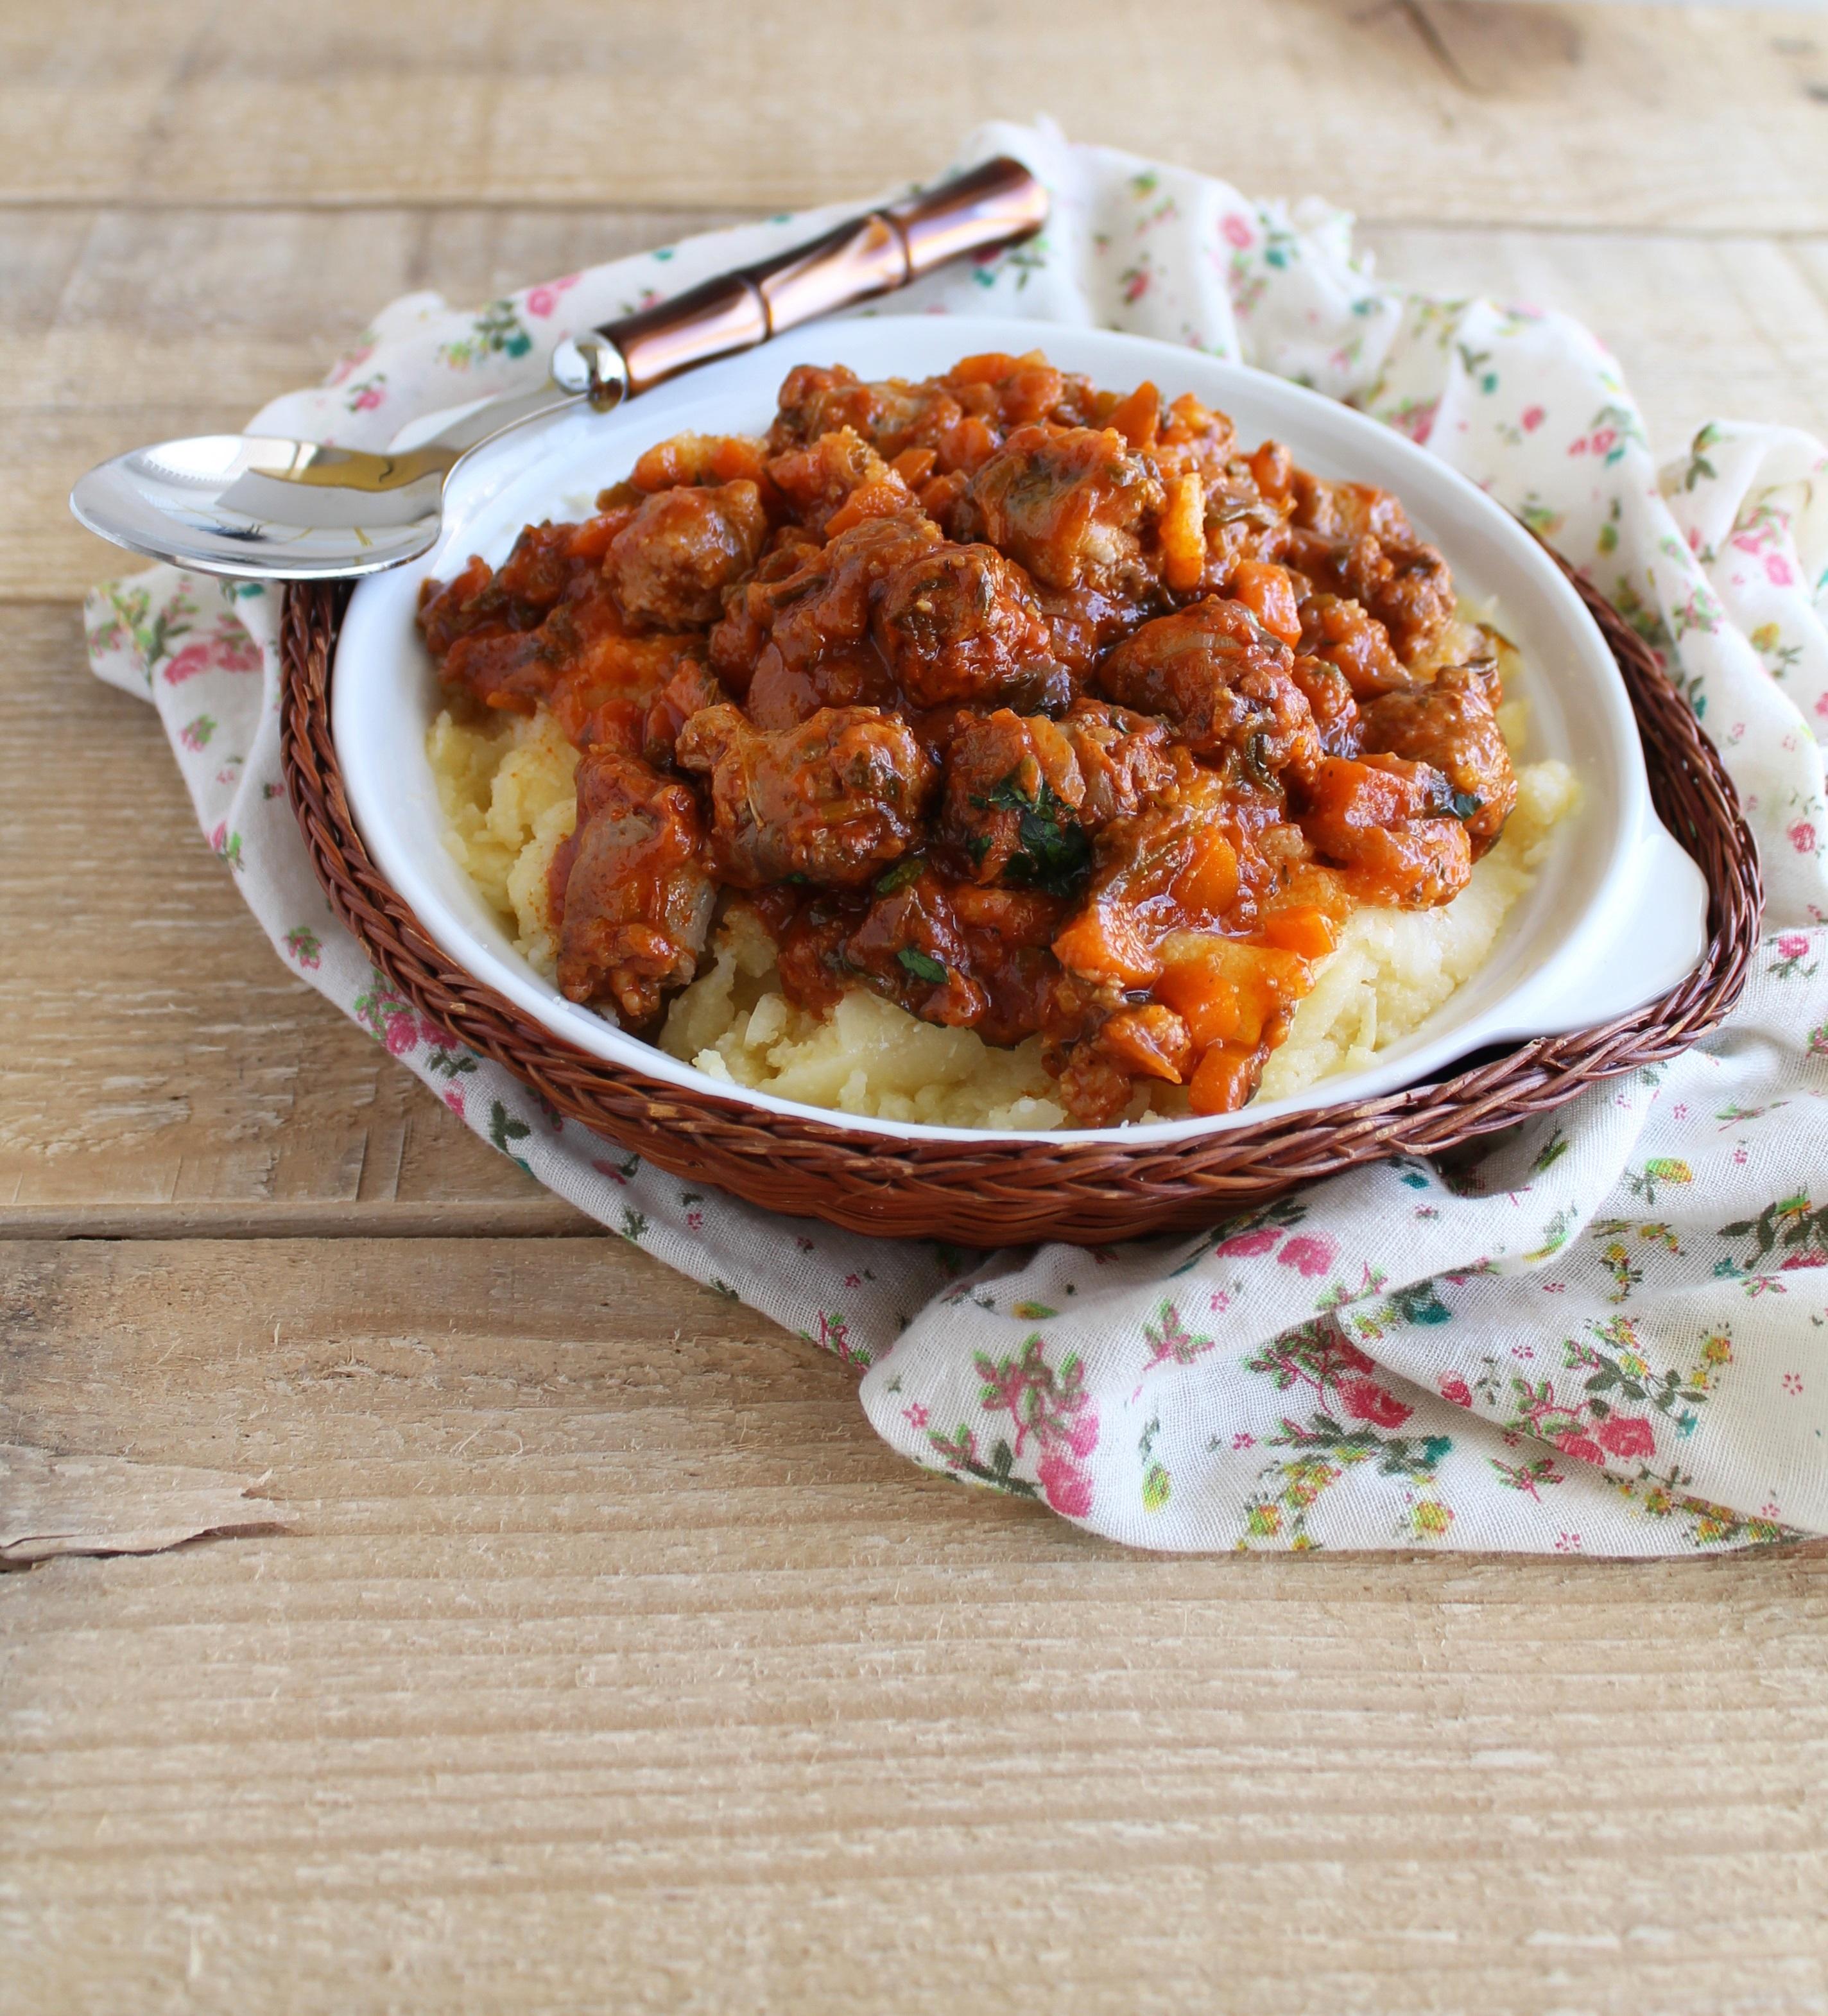 Polenta avec ragoût de saucisson - La Cassata Celiaca